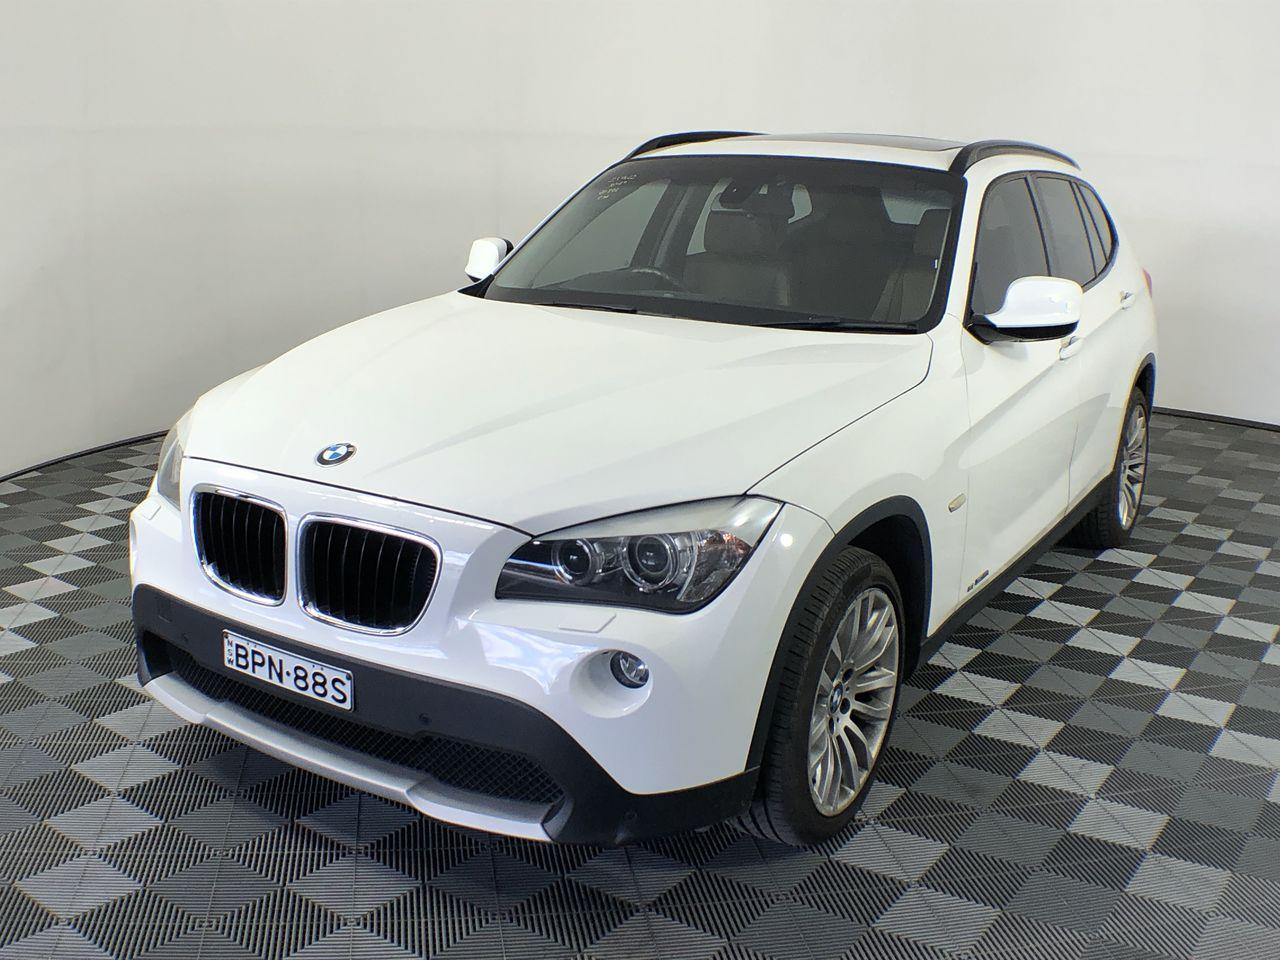 2010 BMW X1 sDrive 18i E84 Automatic Wagon - 104,204km